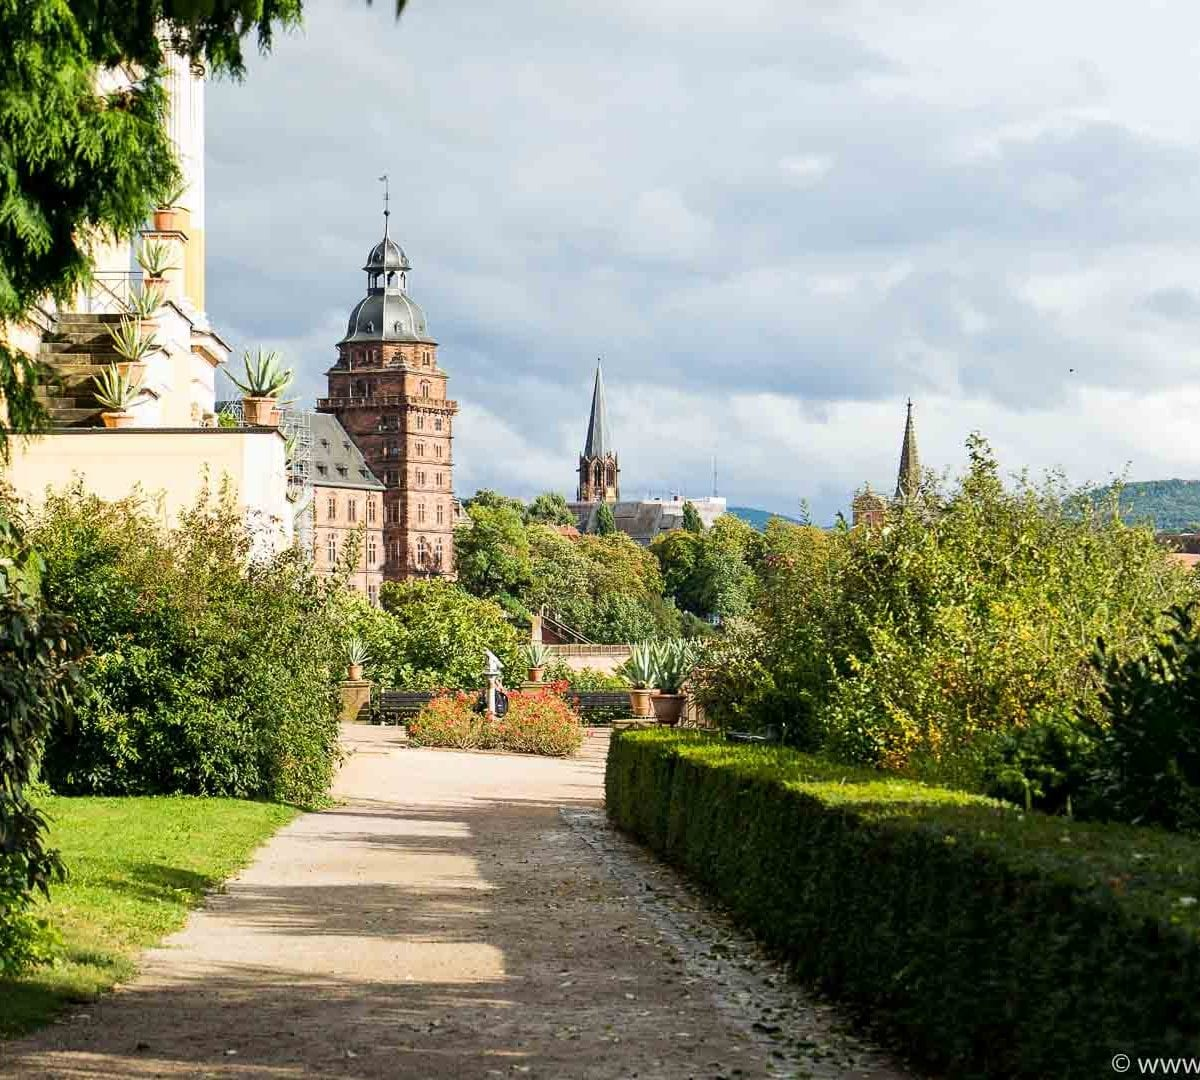 Aschaffenburg kulinarischer City Guide